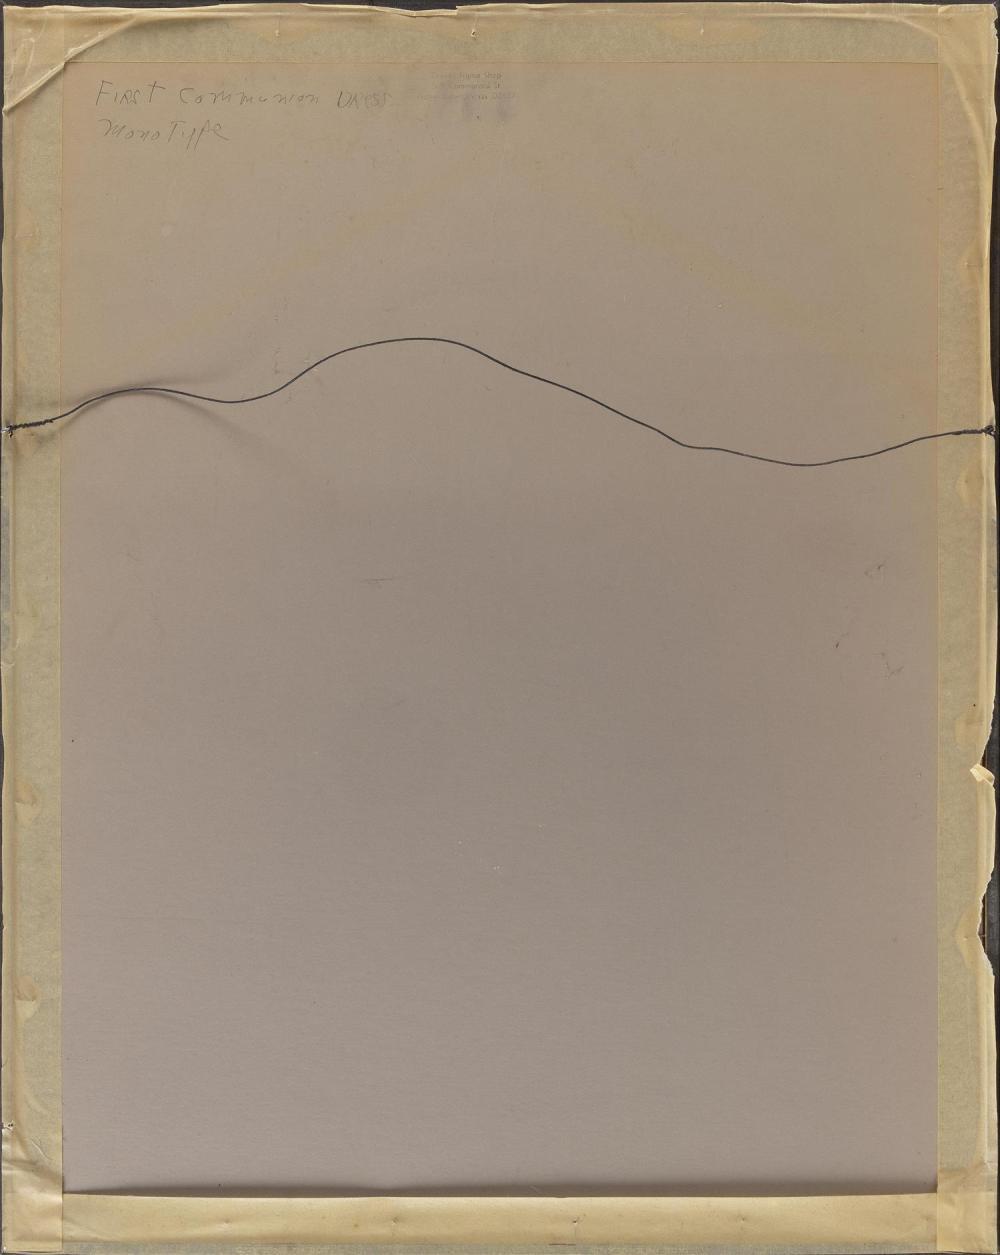 JOAN PEREIRA, Massachusetts/Pennsylvania, b. 1933, Portrait of woman in white., Mixed media on paper, 24